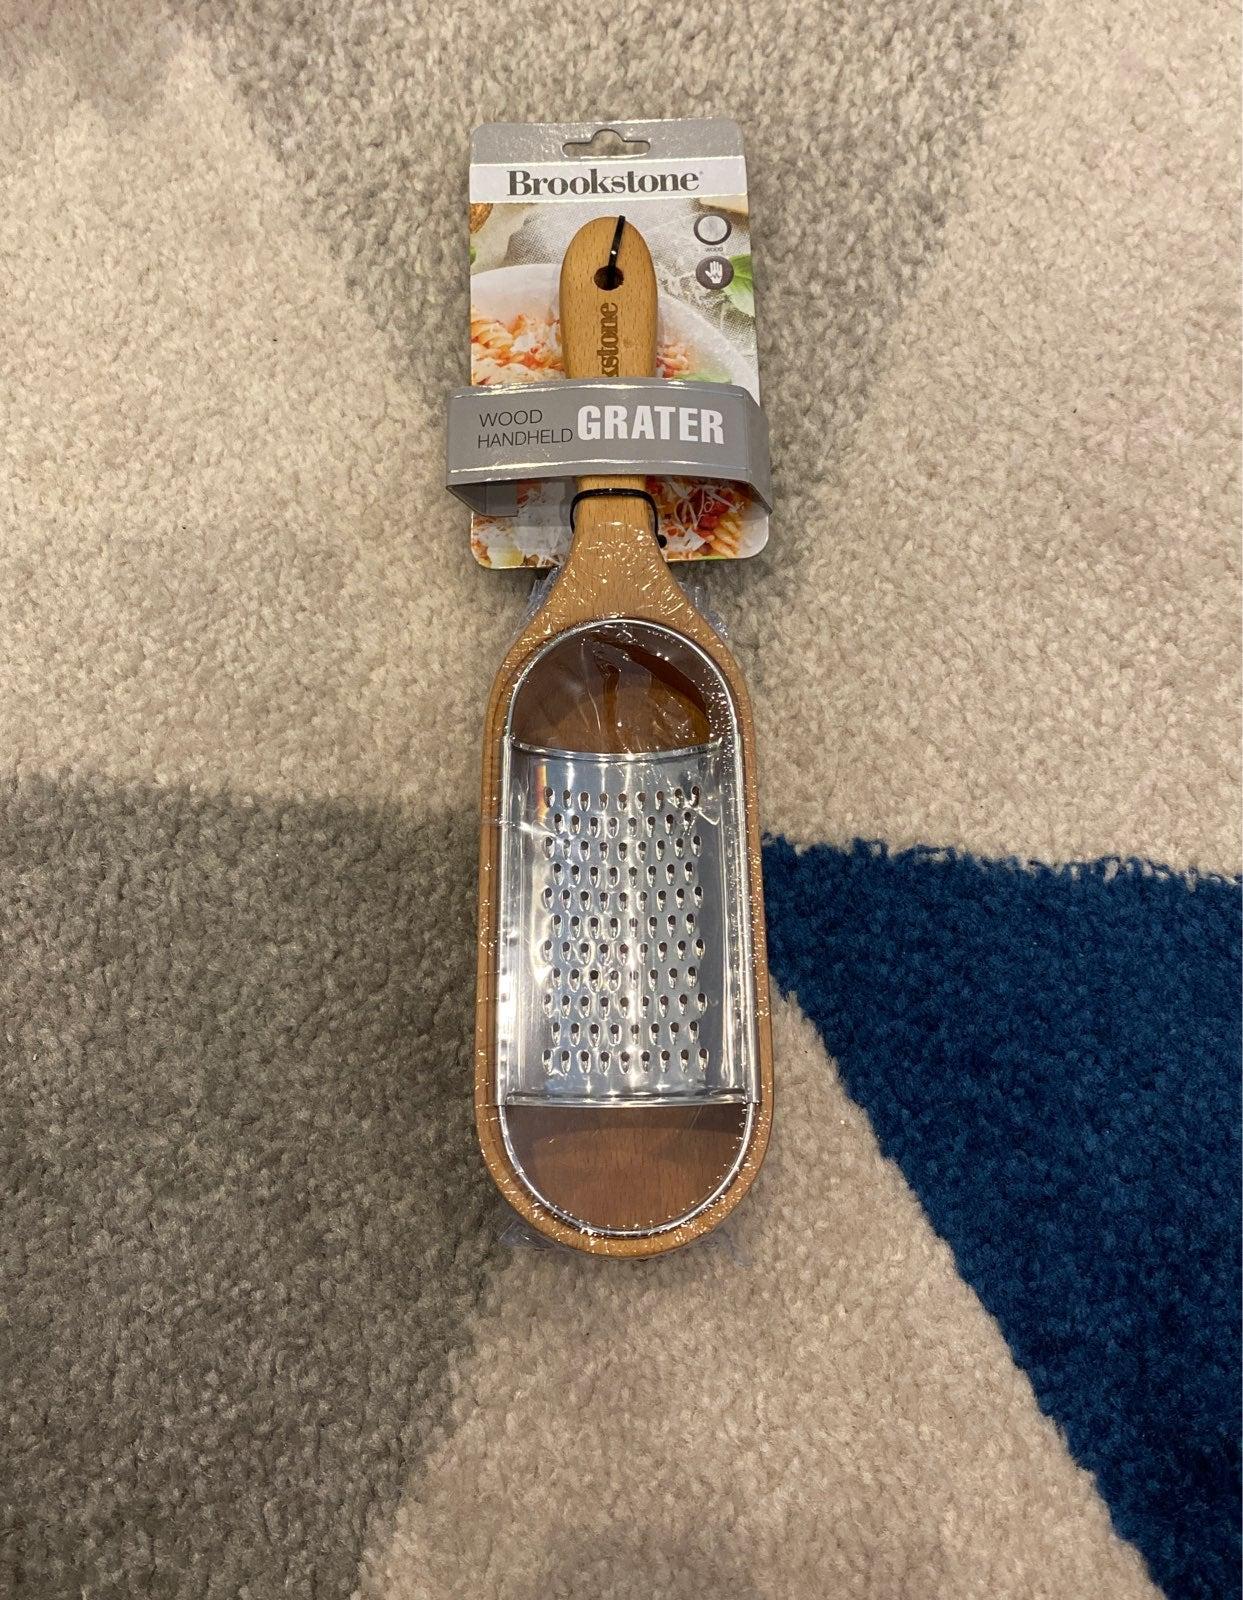 Brookstone wood handheld grater